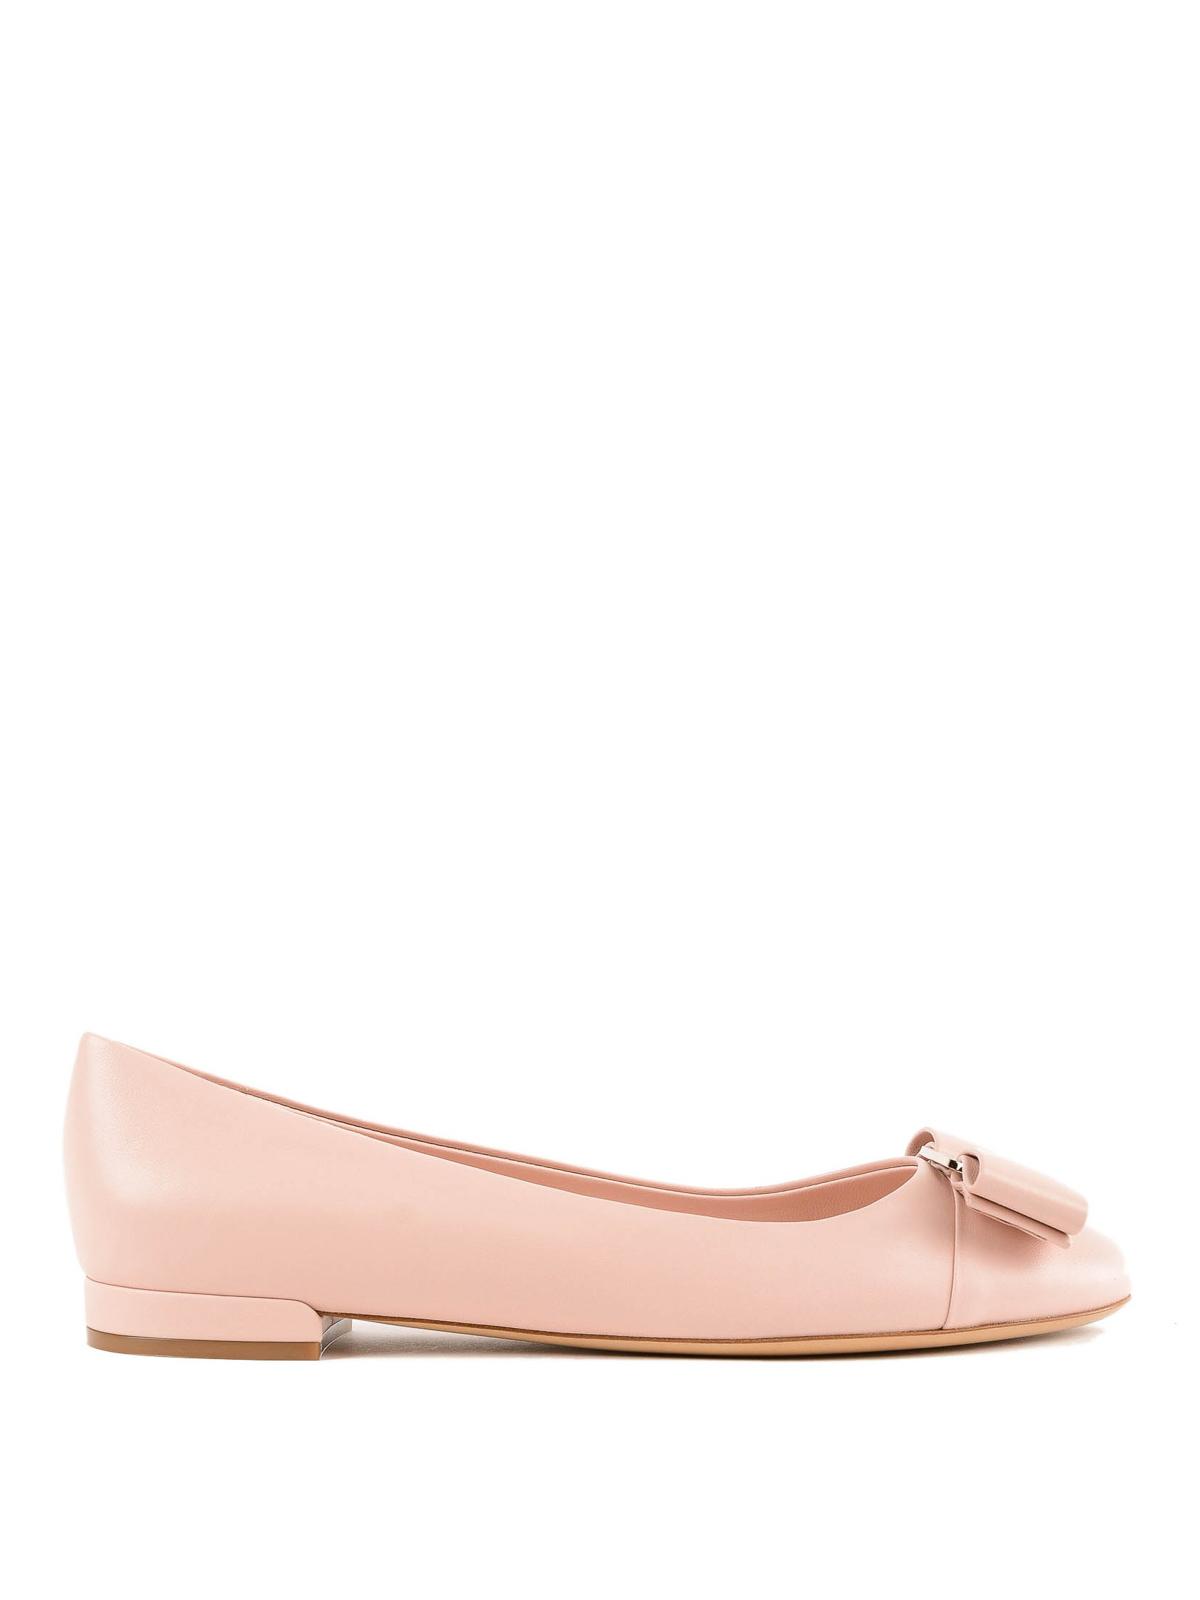 Varina light pink leather flat shoes